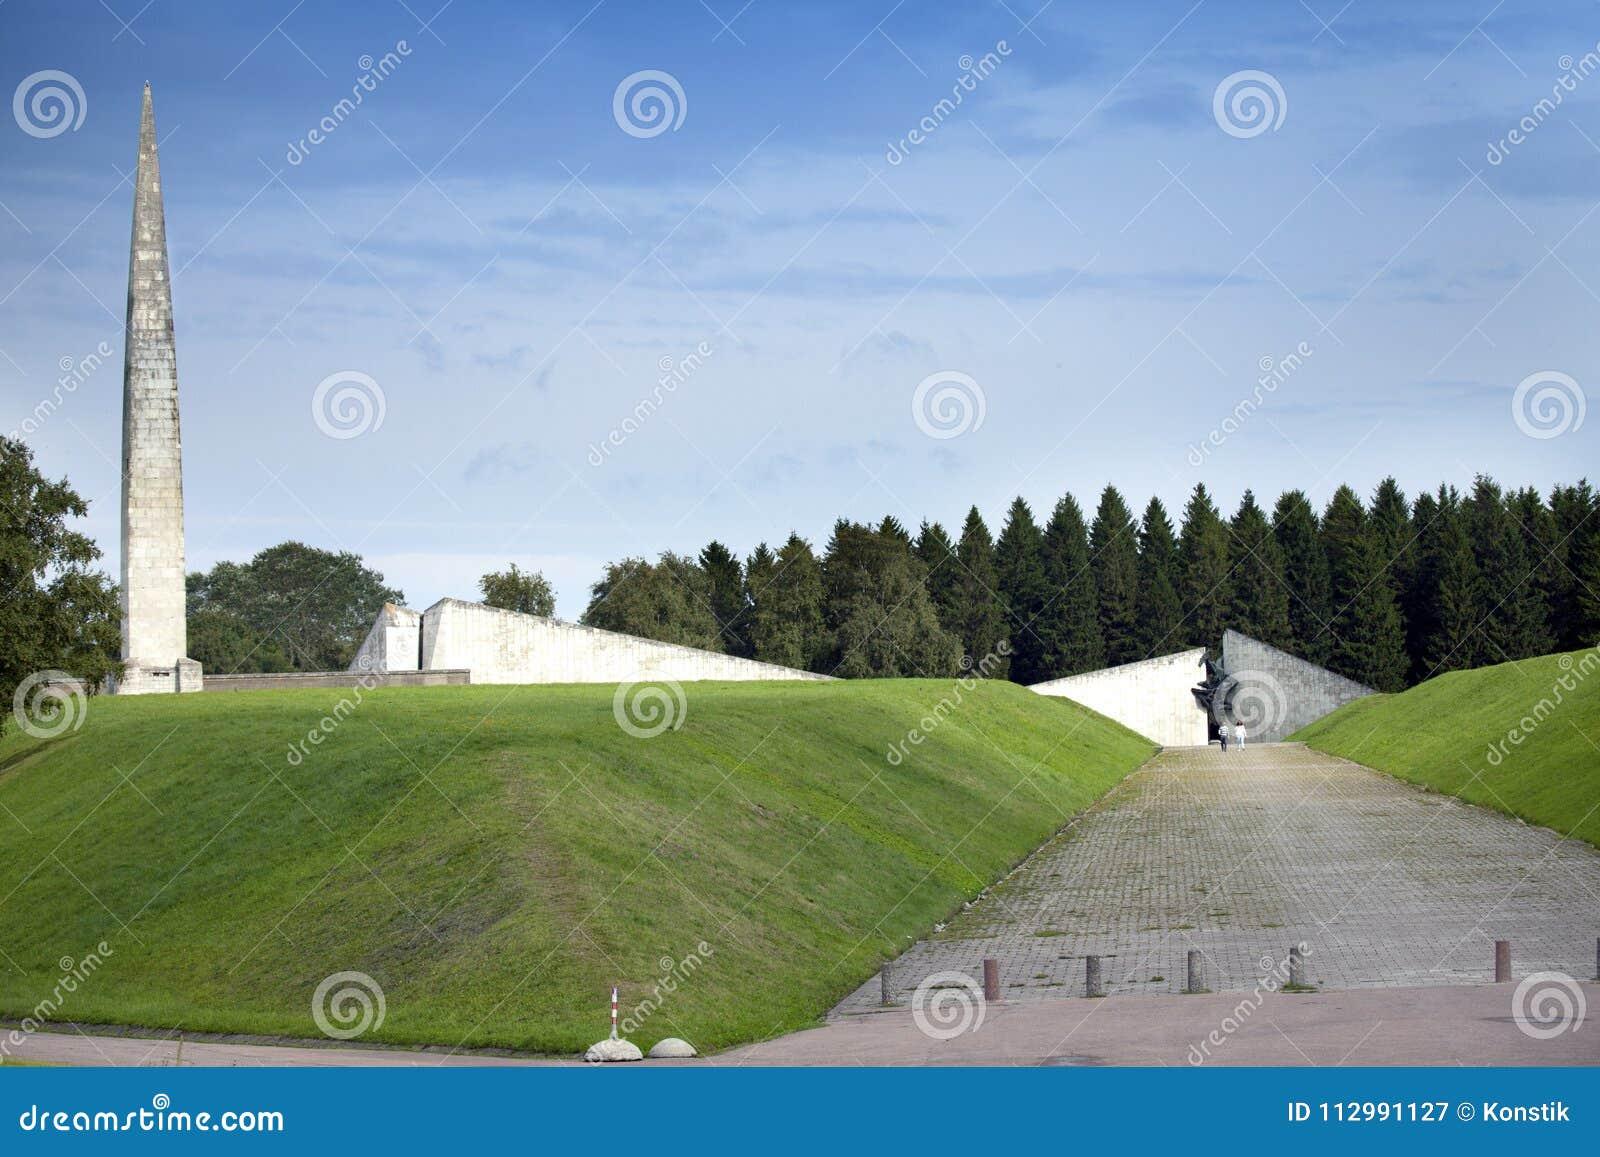 World War II Memorial on Mary Hill Maarjamae in the district of Pirita, Tallinn , the capital of Estonia